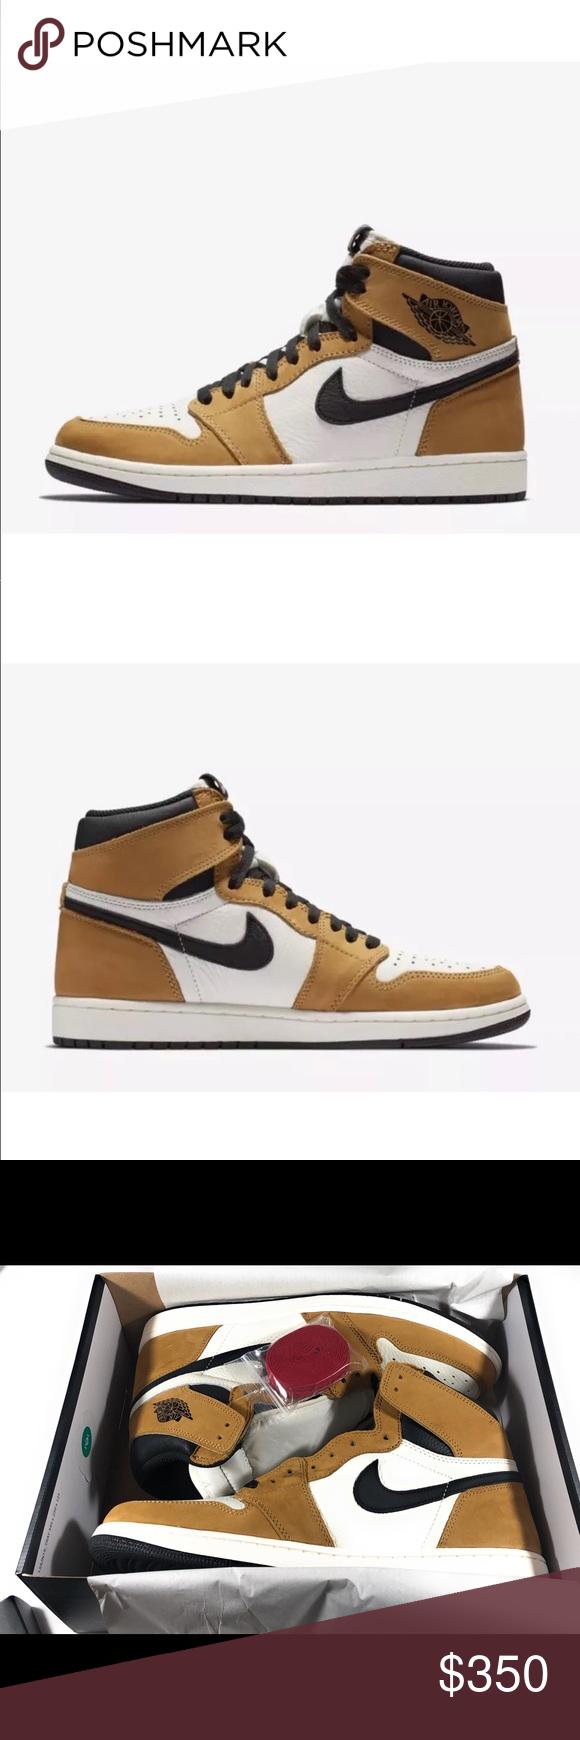 online retailer ce8b1 cf6e1 I just added this listing on Poshmark  Nike Air Jordan 1 Retro High OG  Rookie Of The Year.  shopmycloset  poshmark  fashion  shopping  style   forsale  Nike ...